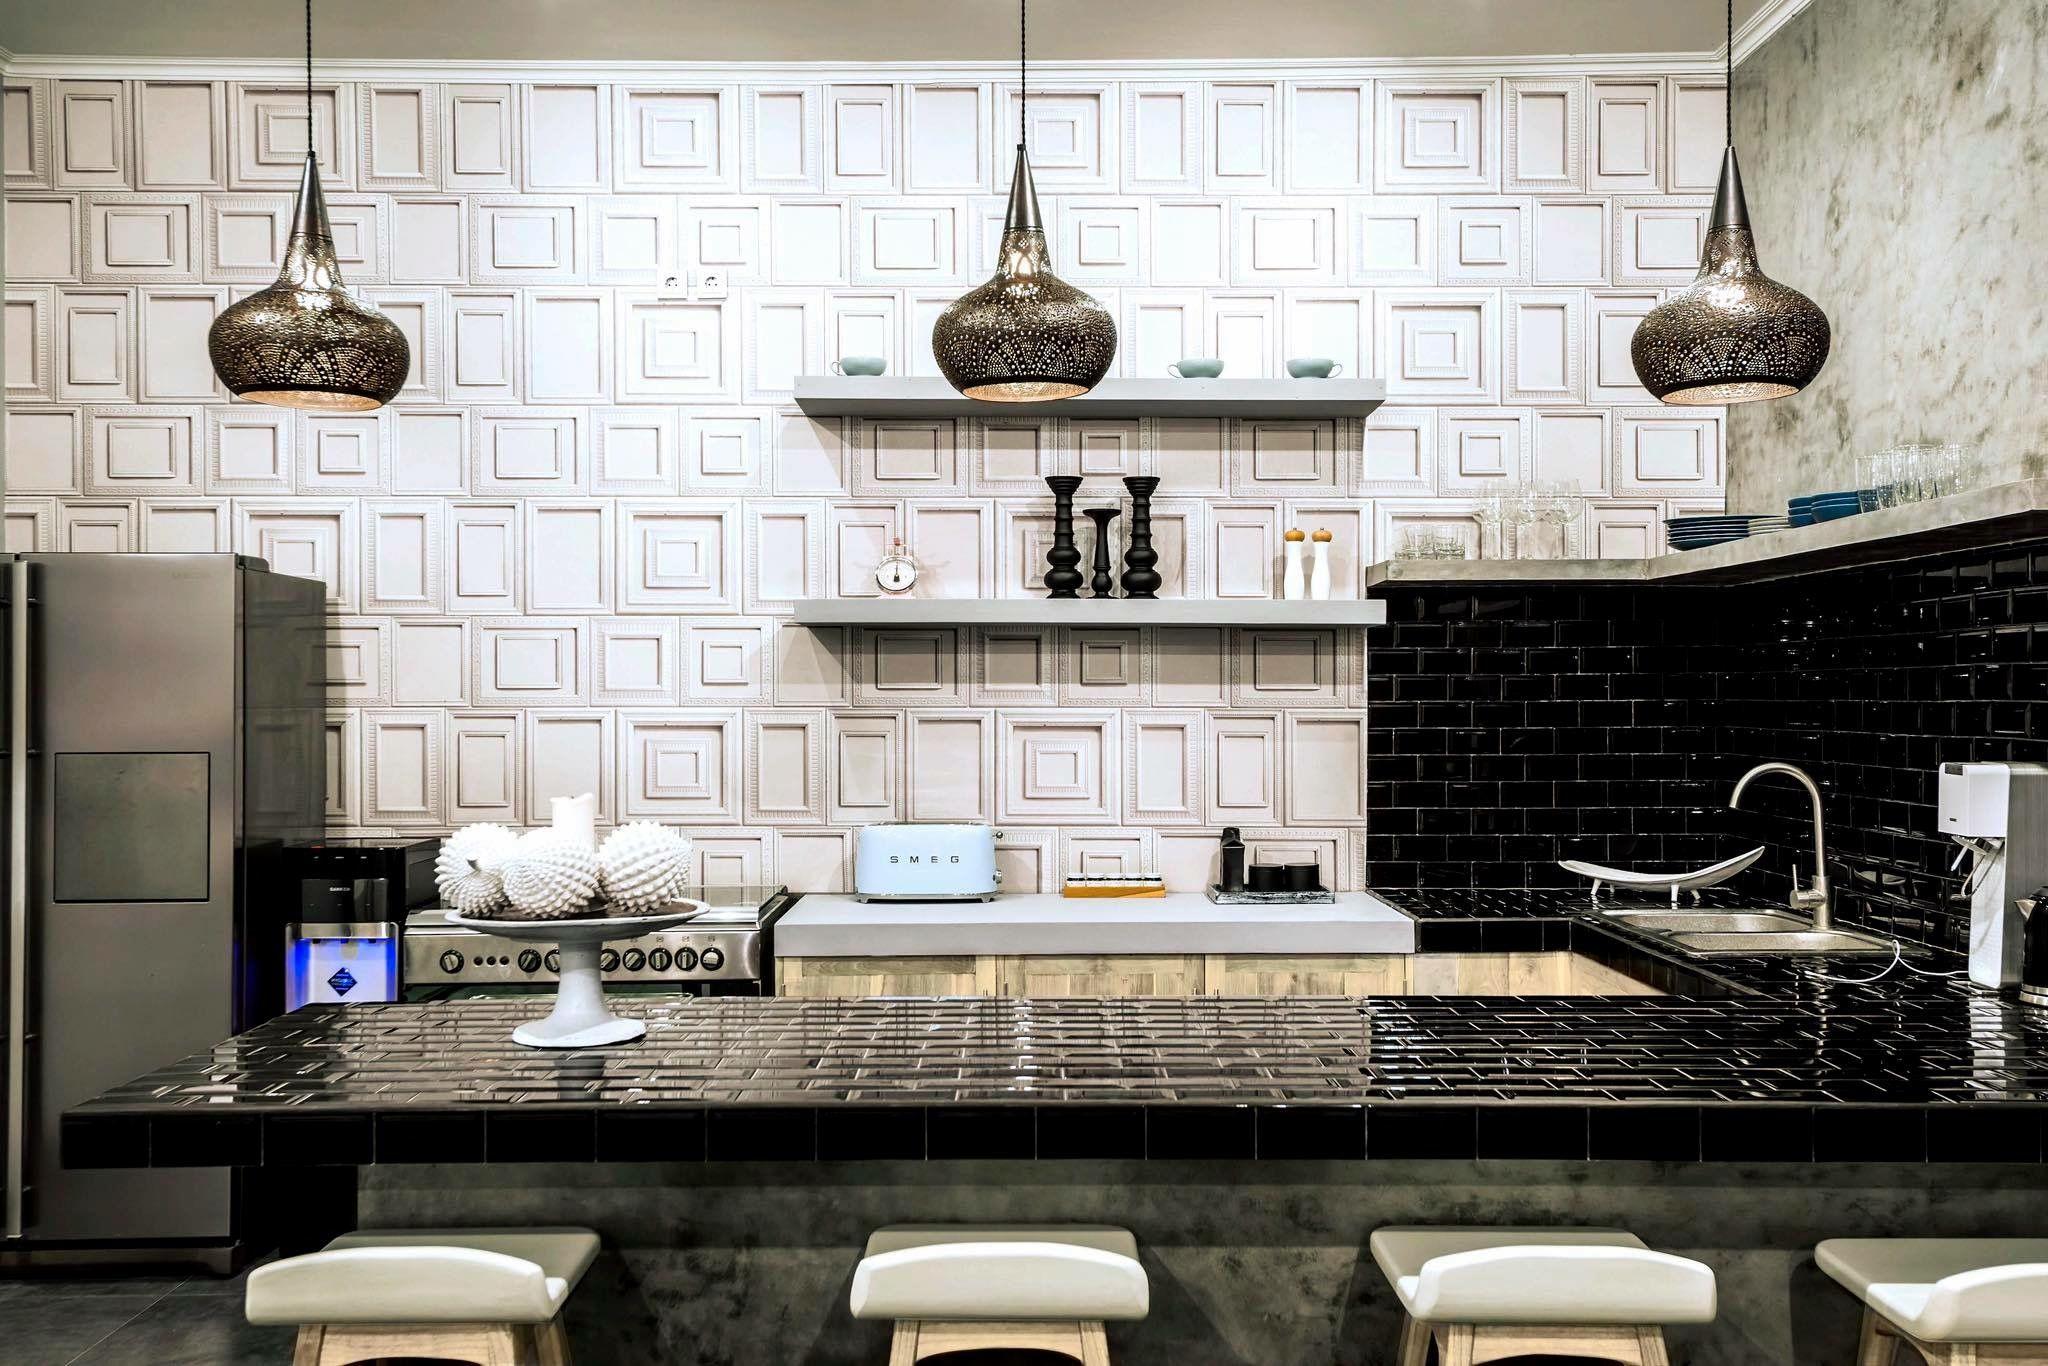 Hummingbird Home Decor Bali   Wallpaper For Villa On Petitenget, Seminyak